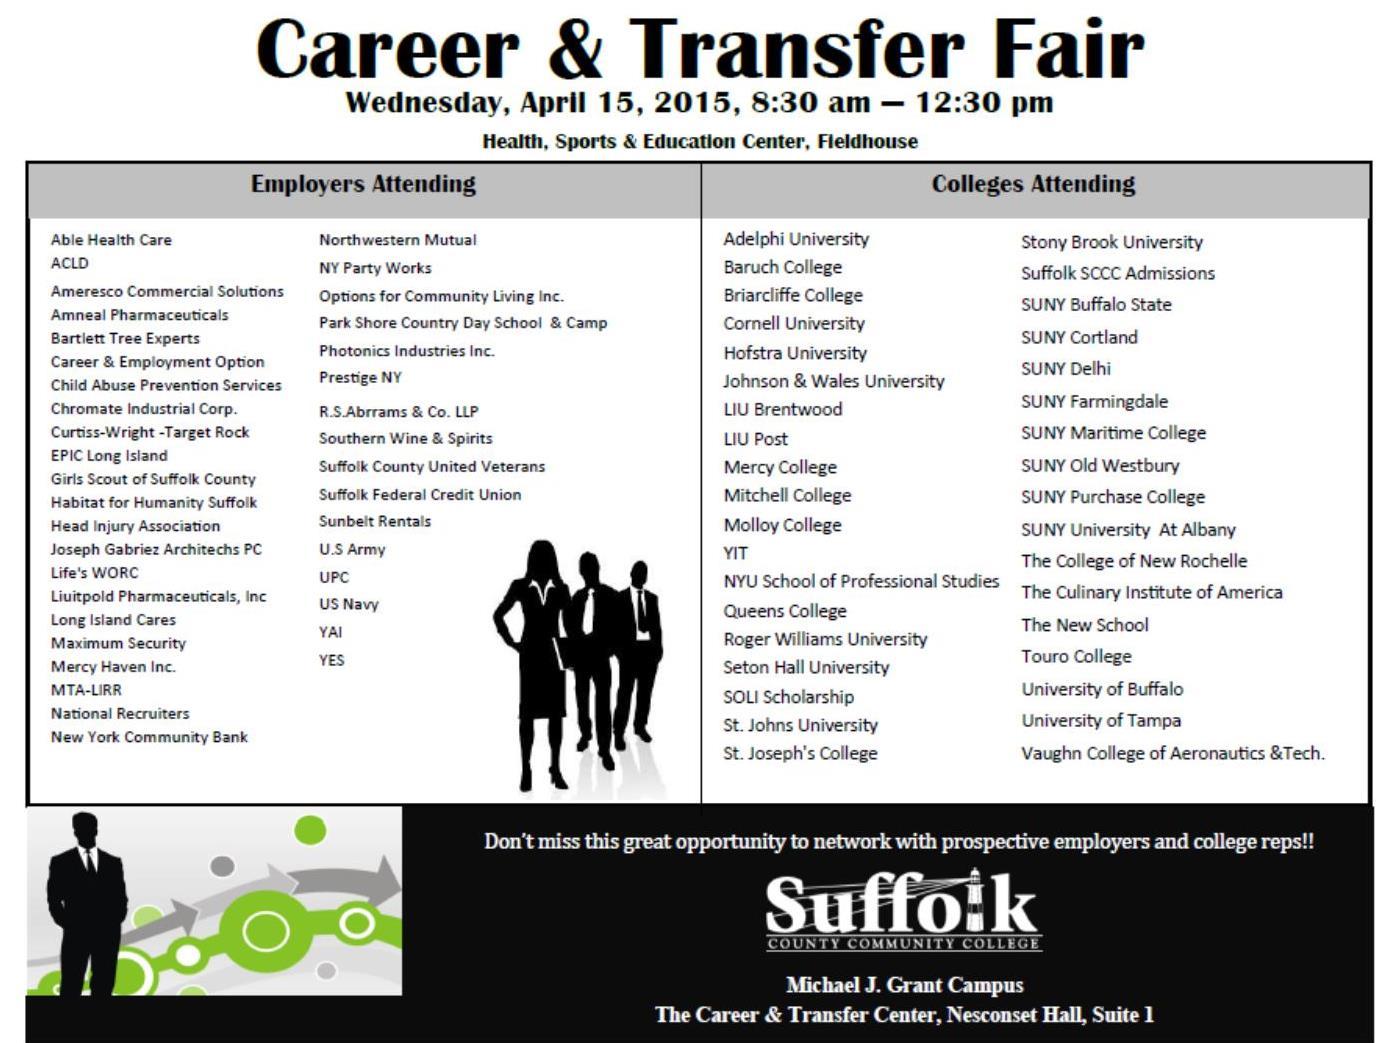 Sccc Grant Campus Map.High School Suffolk County Community College Alumni